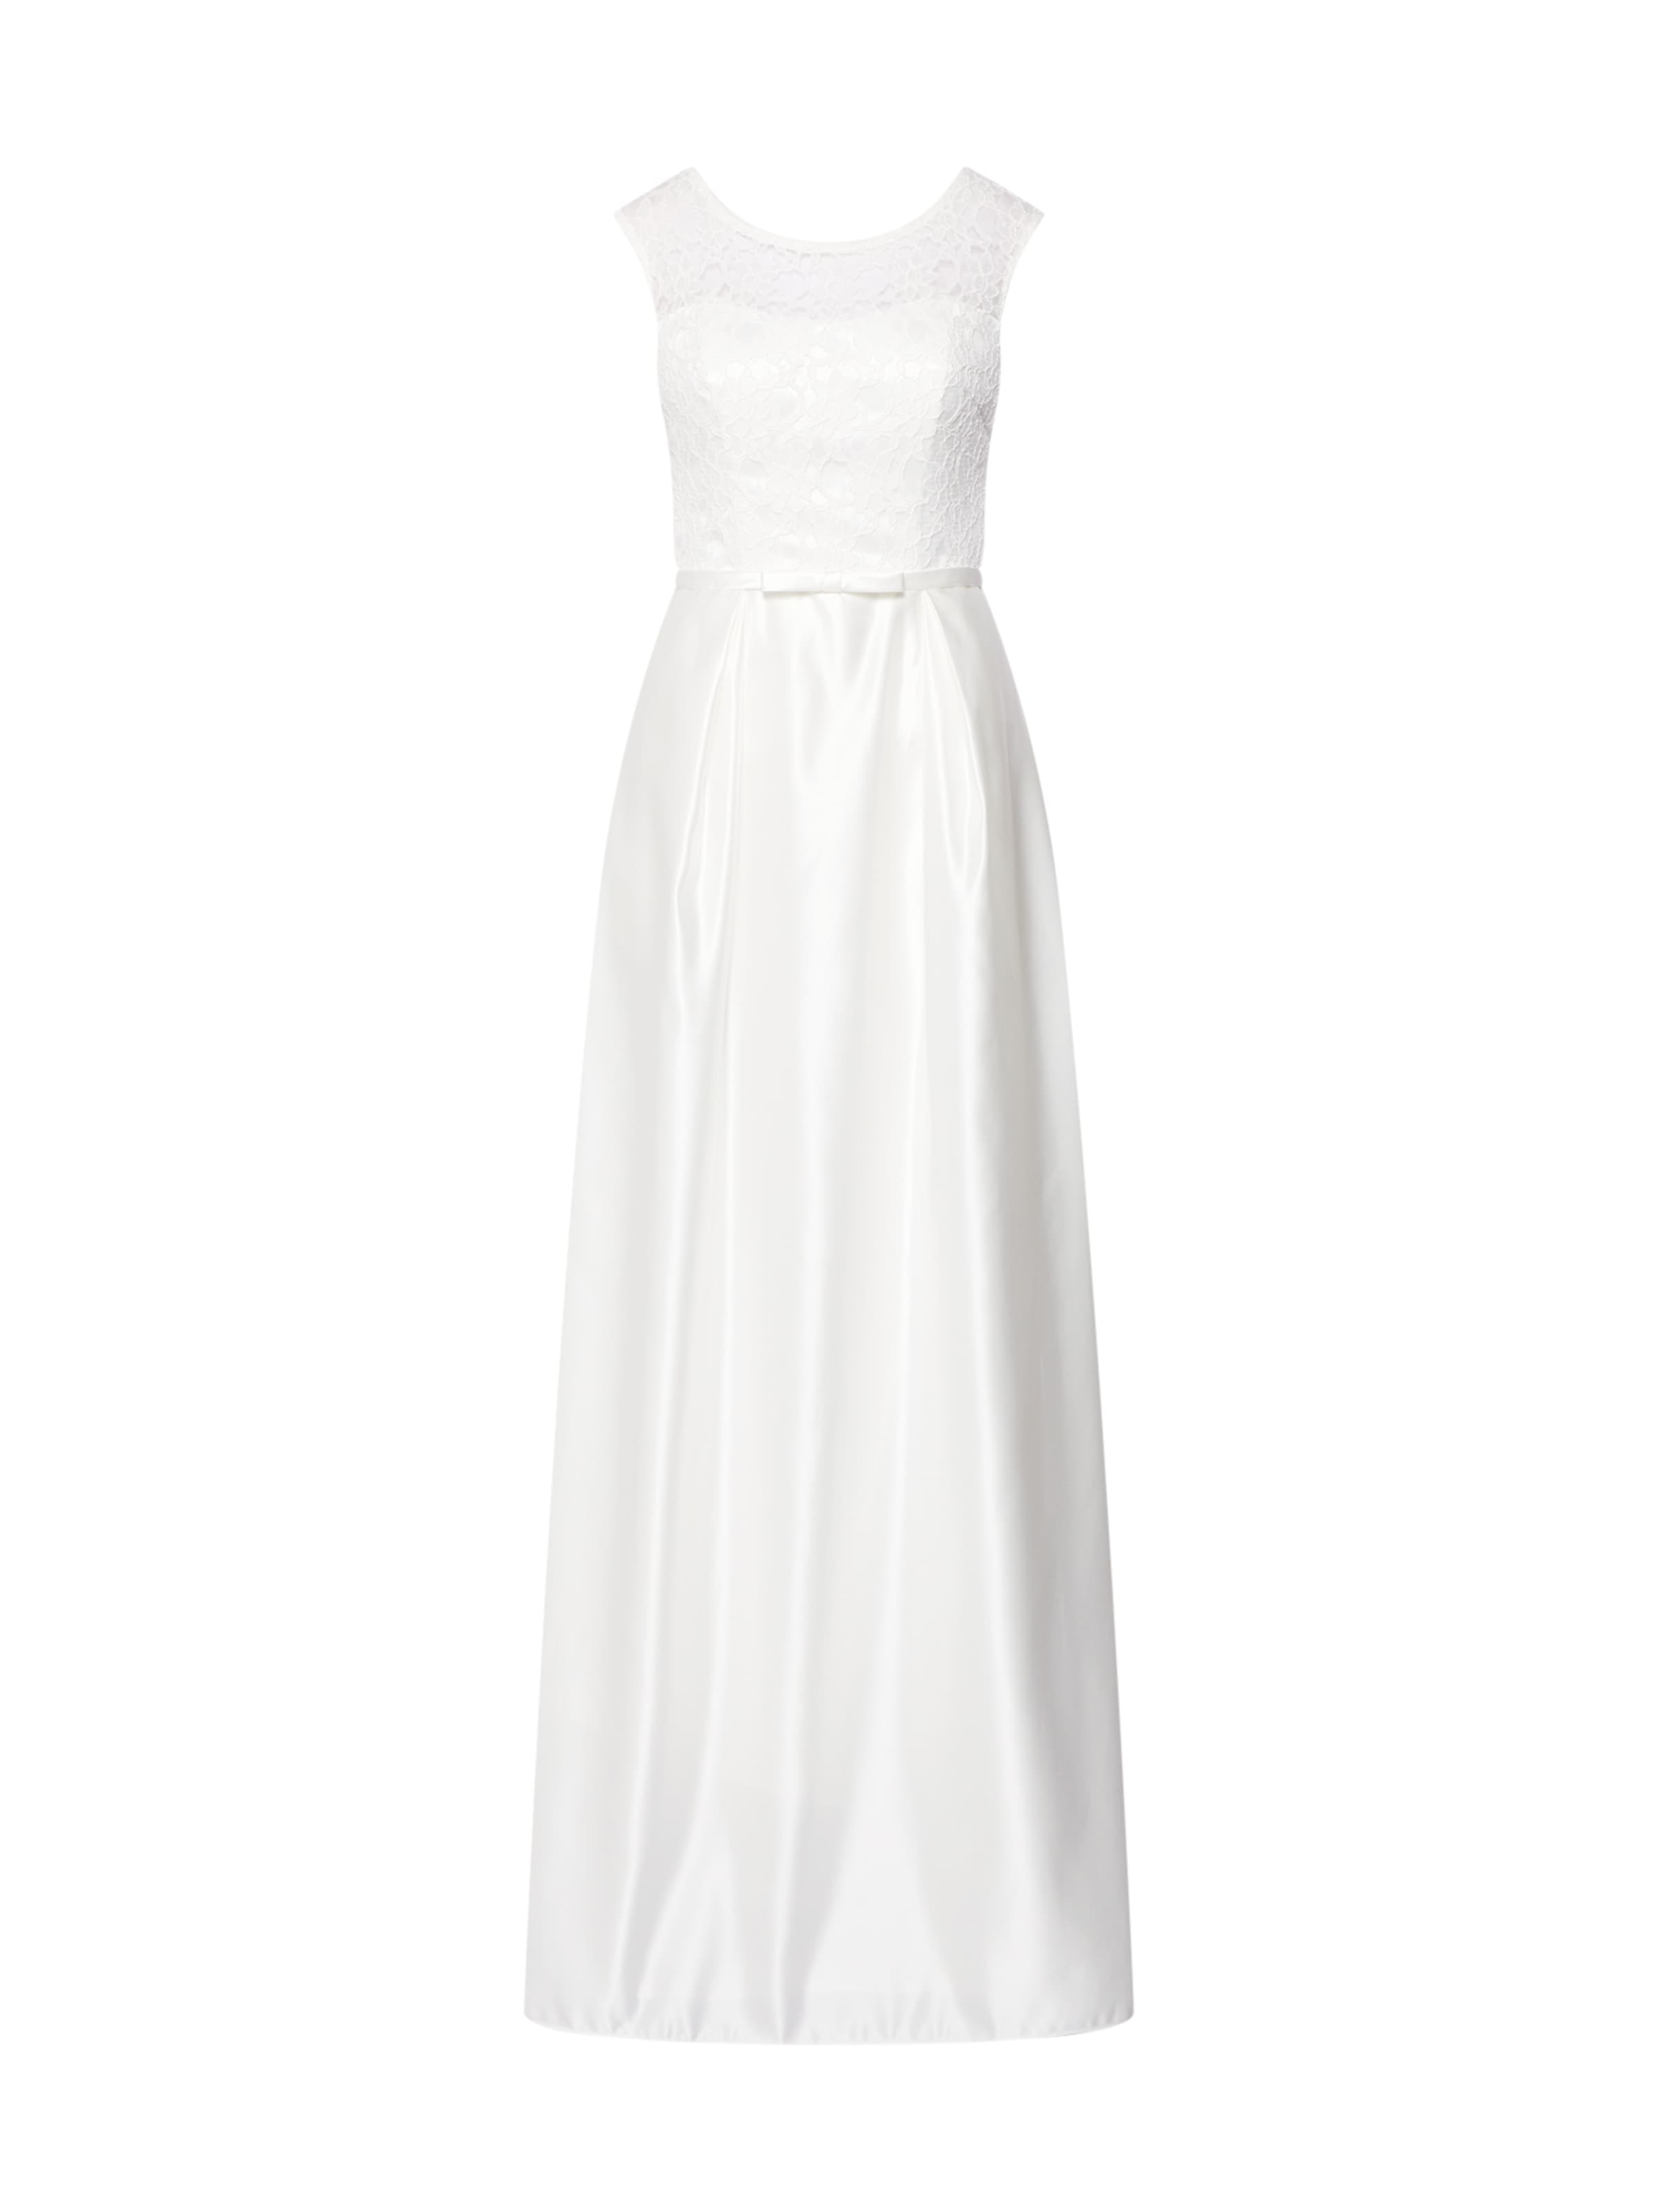 In Hochzeitskleid Star Star Hochzeitskleid Night Night Perlweiß 7vfbgY6y